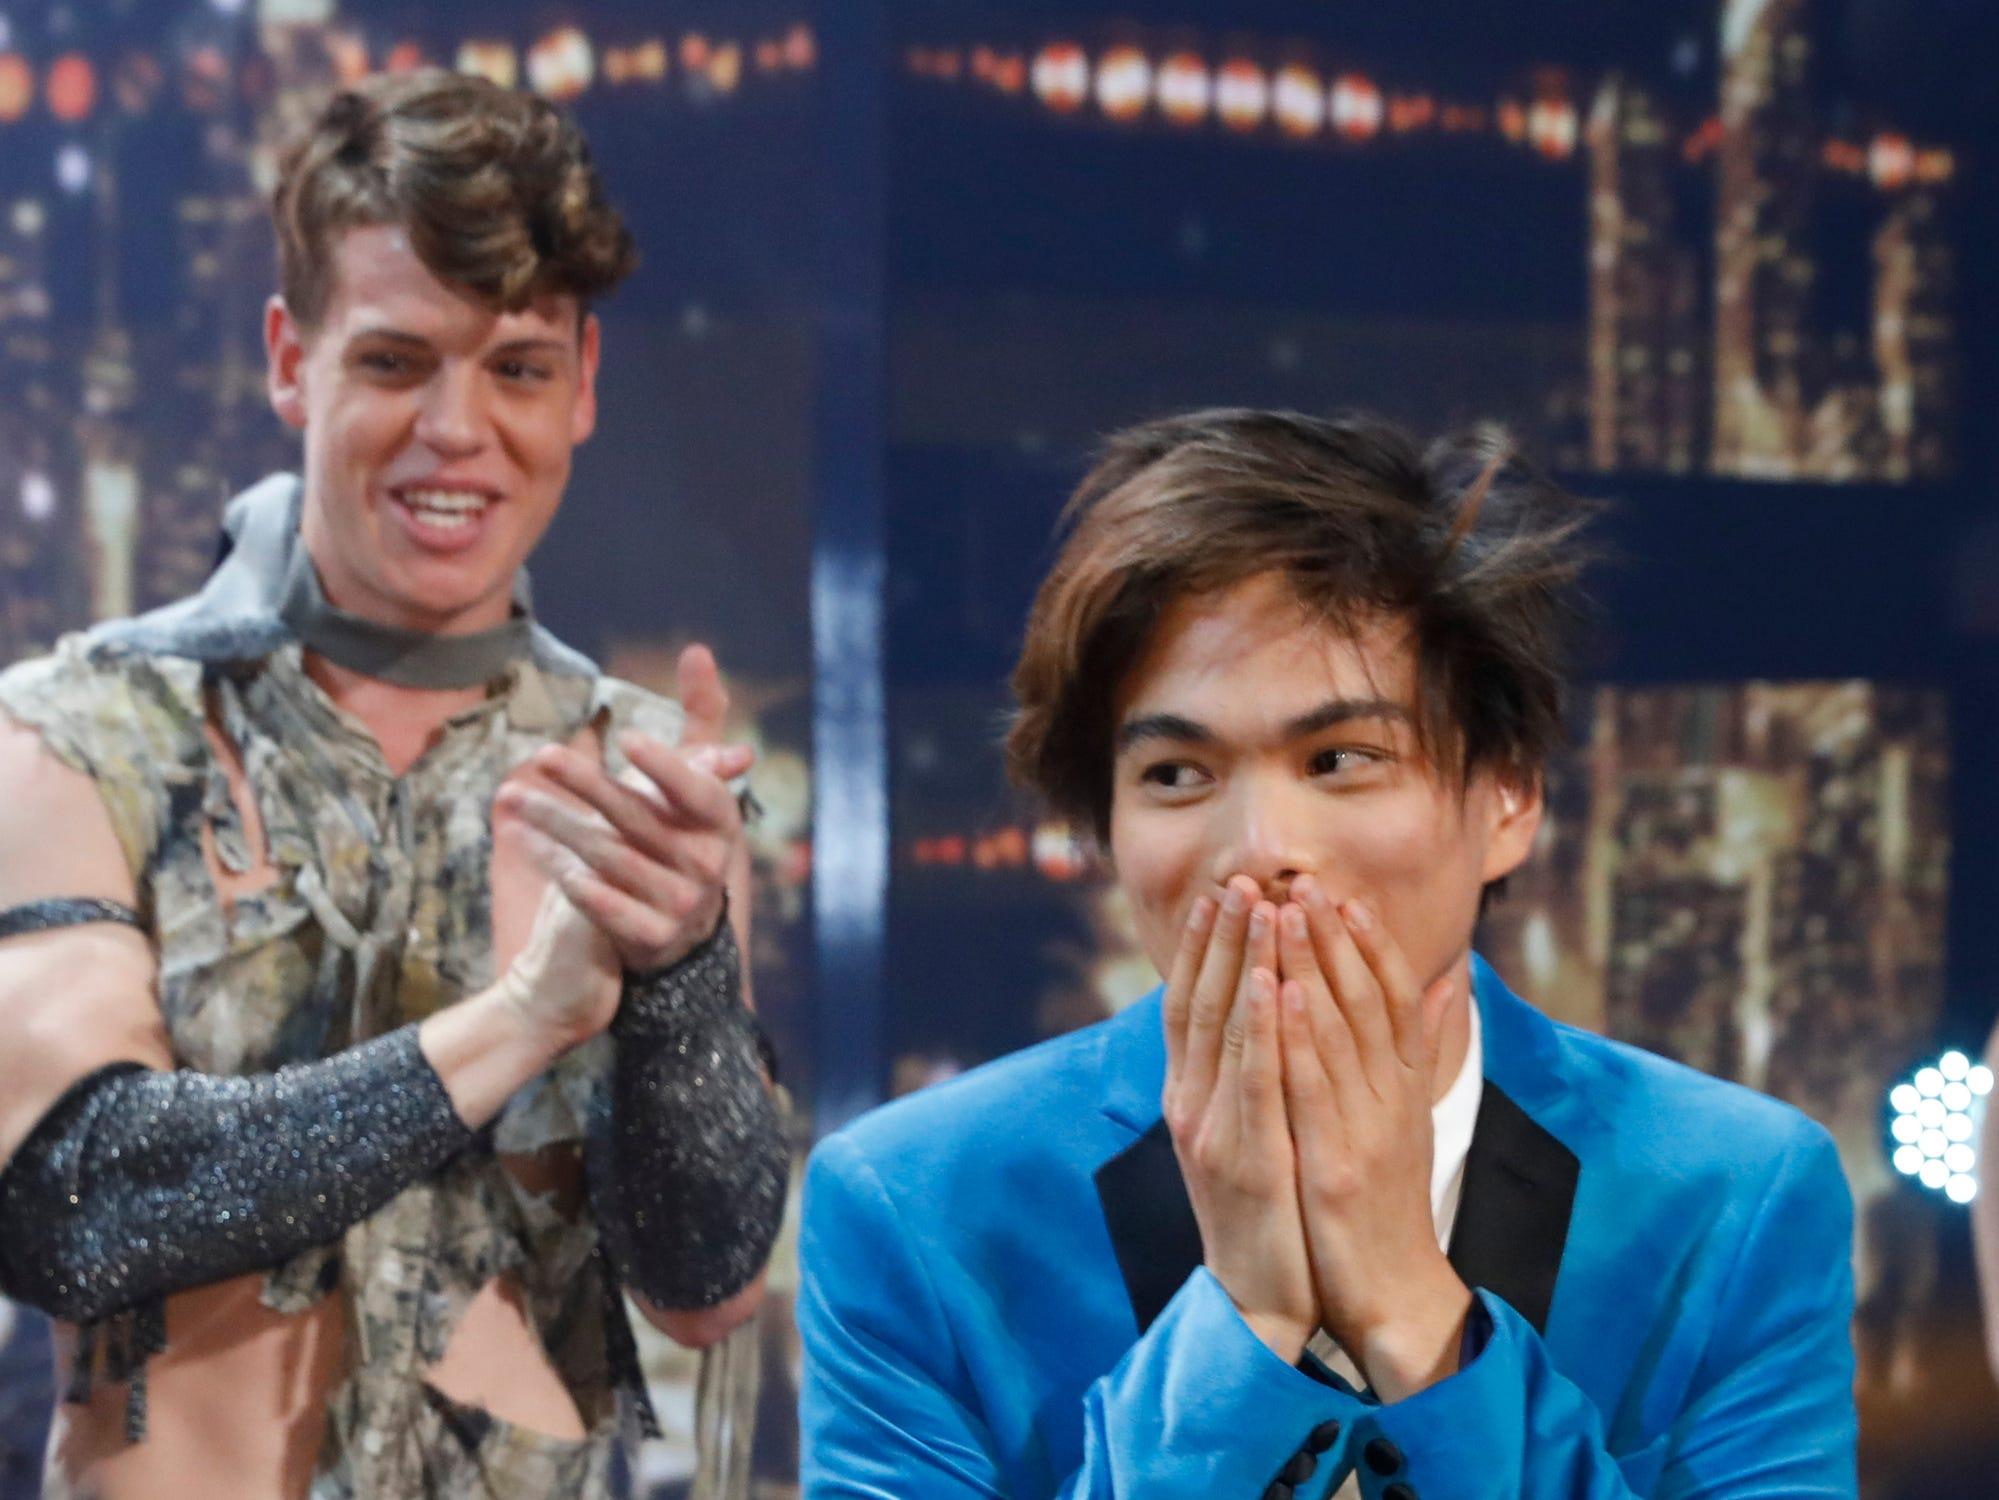 'America's Got Talent': What did Simon Cowell say that helped Shin Lim win Season 13?